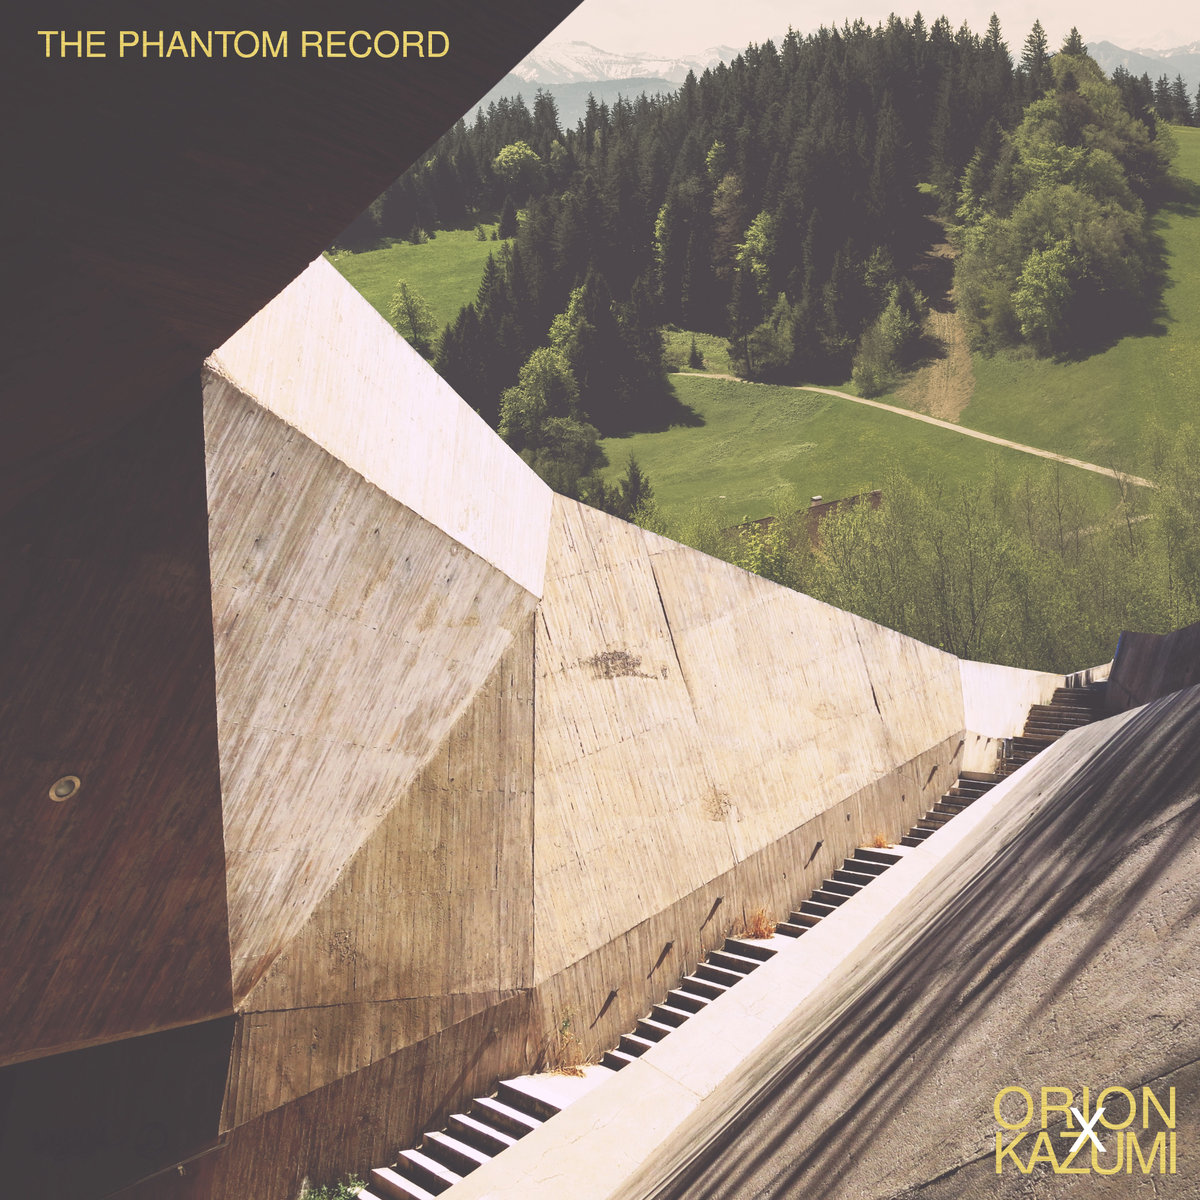 Orion & Kazumi – The Phantom Record EP